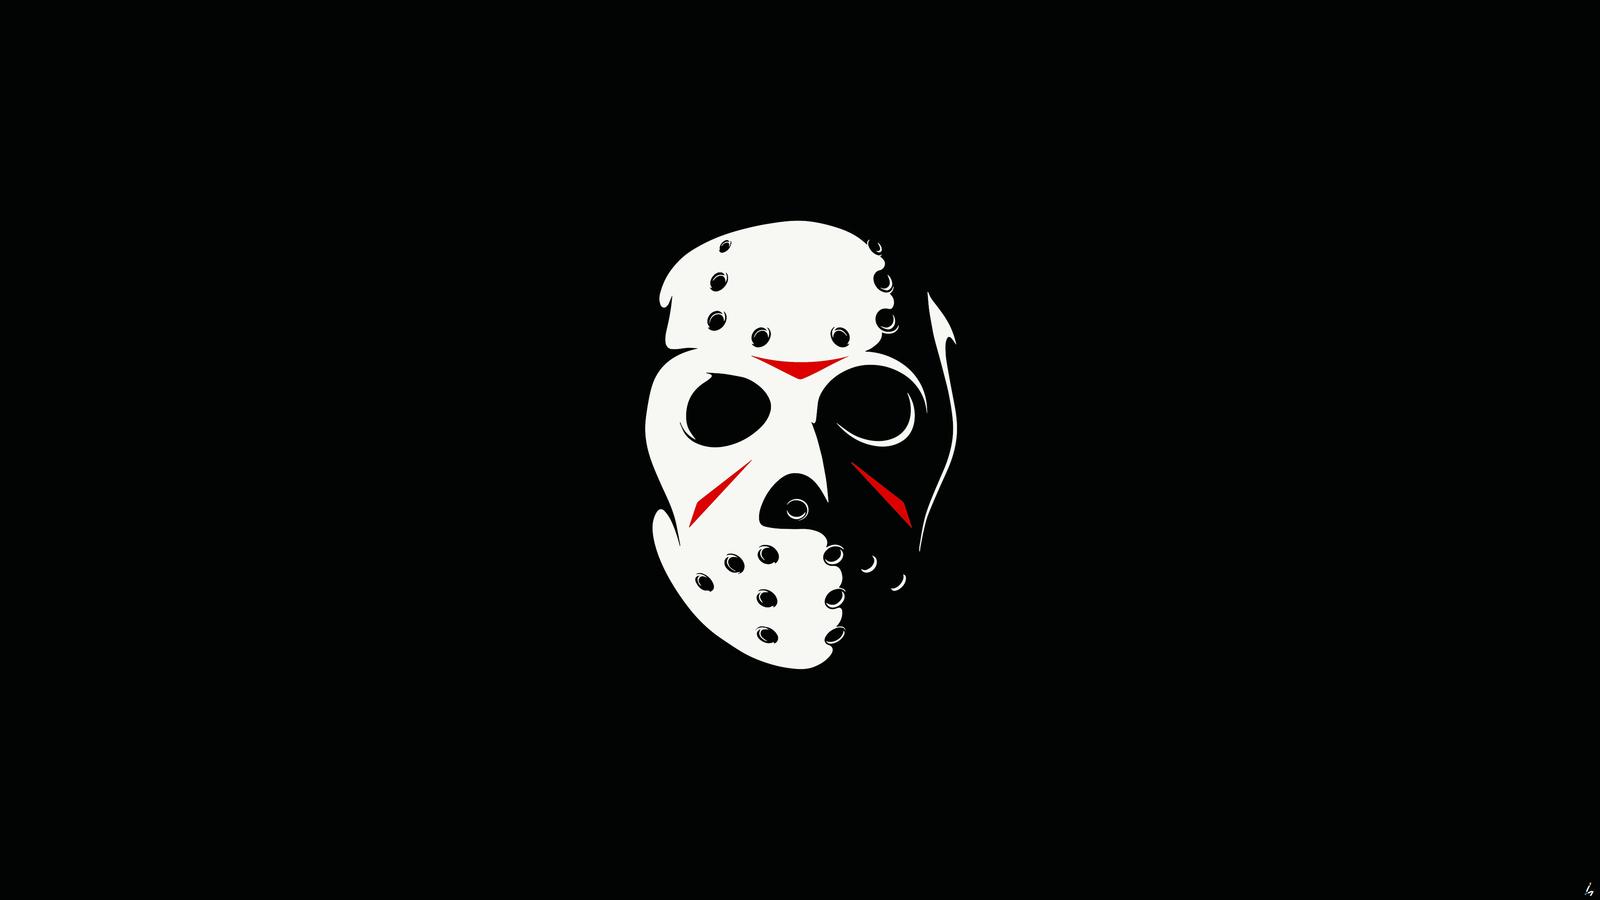 1600x900 Friday The 13th The Game Minimalism Dark 4k 1600x900